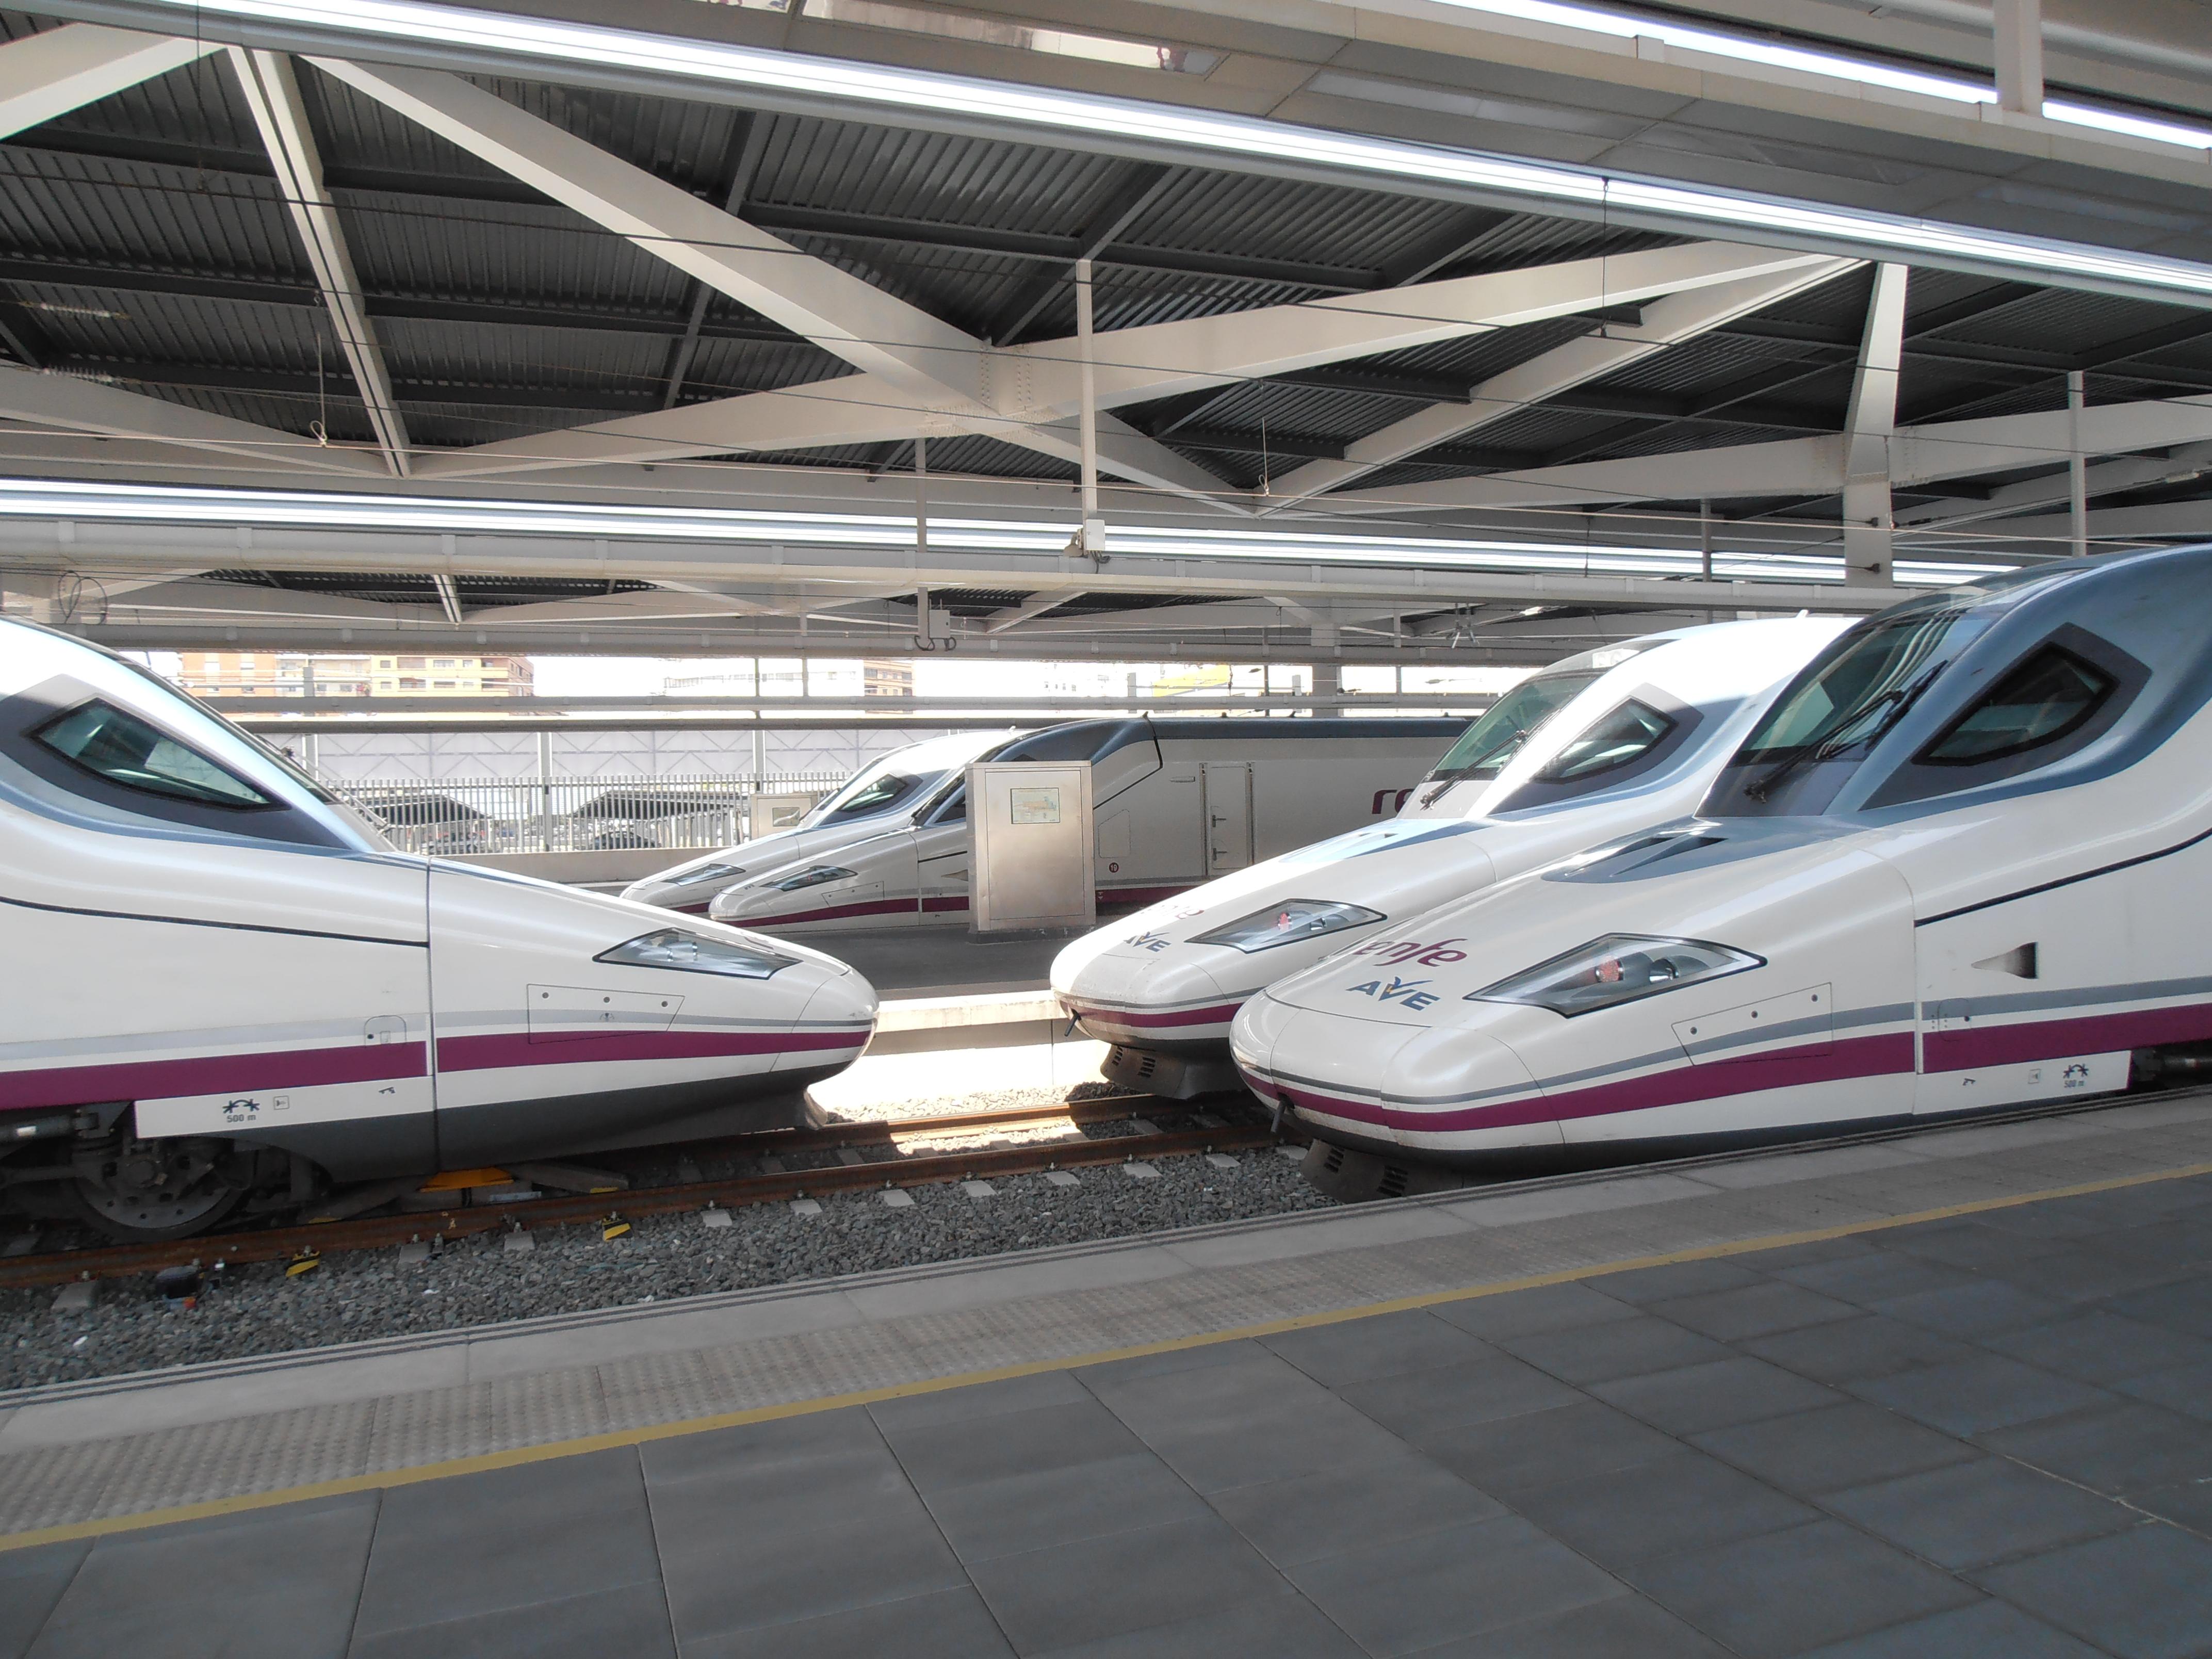 Diversos S.112 estacionados en València-Joaquín Sorolla